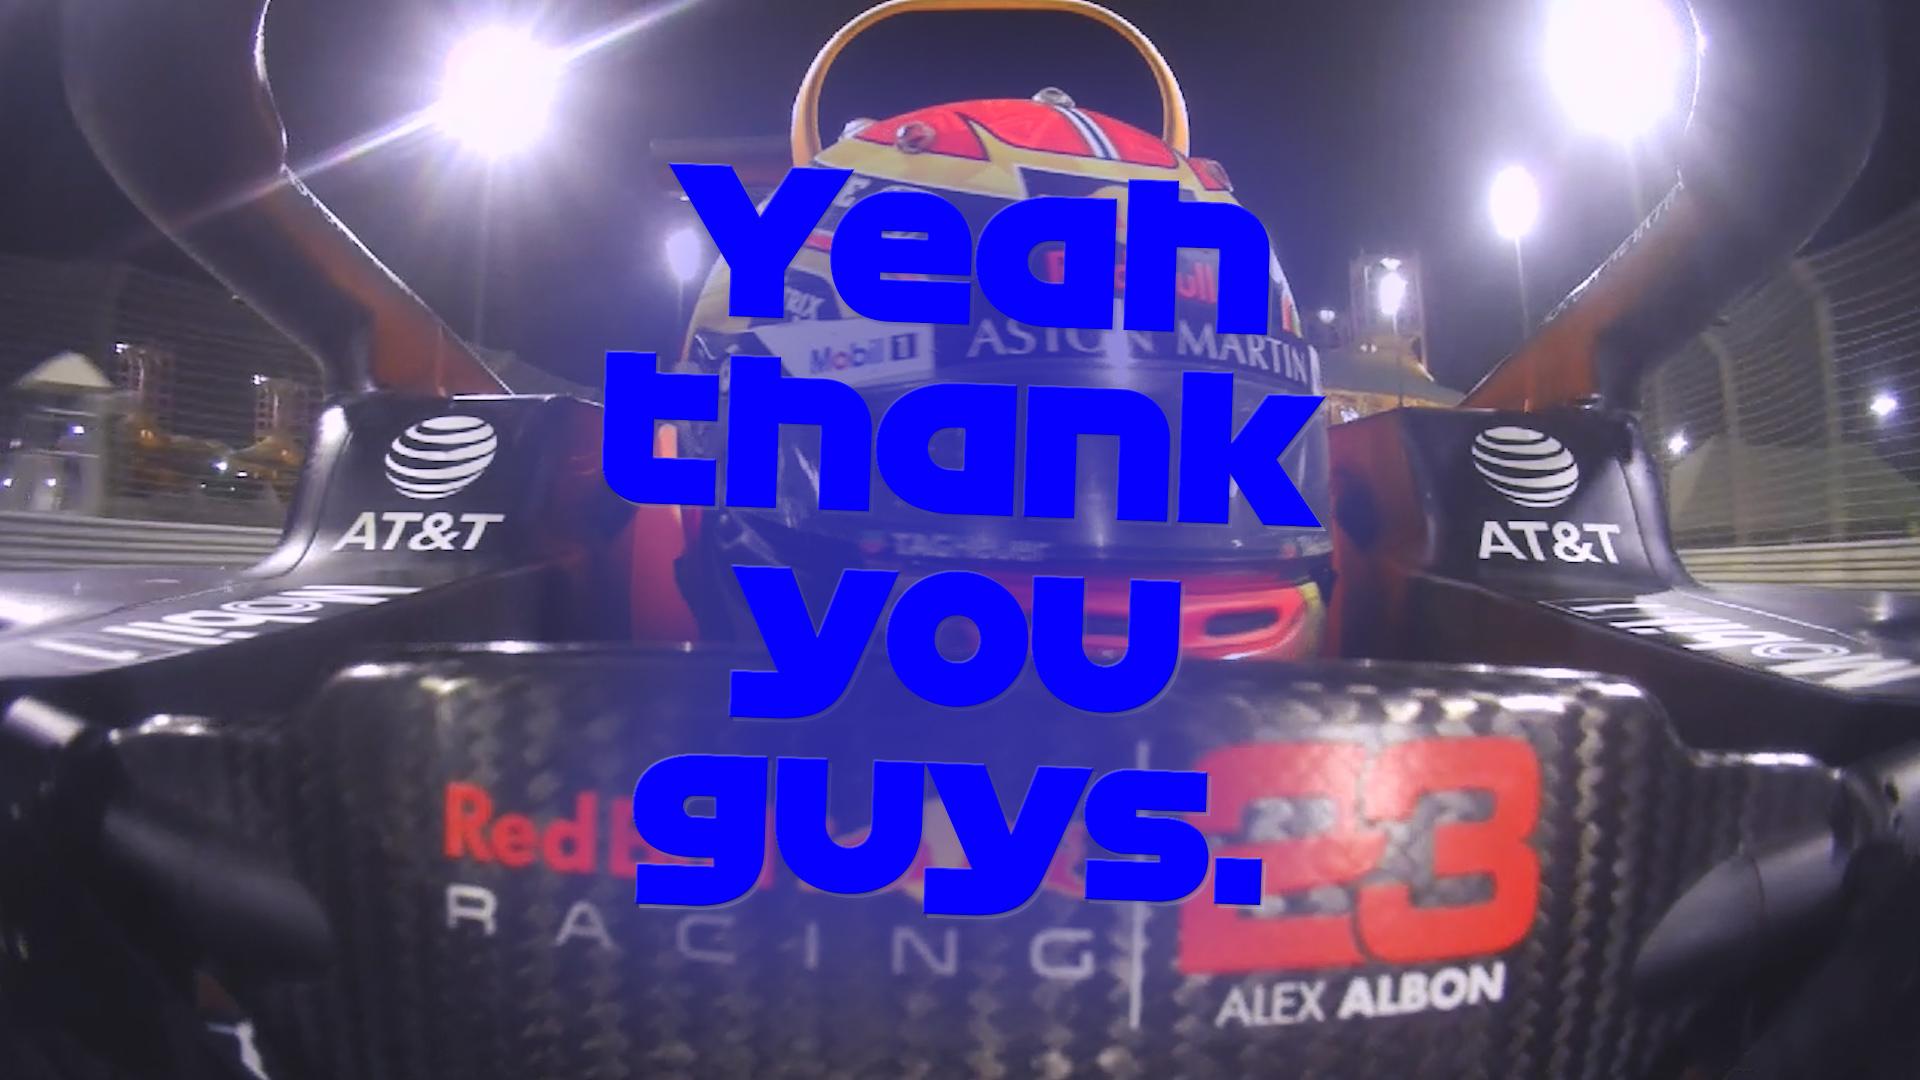 2020 Bahrain Grand Prix: Red Bull react after Albon grabs podium